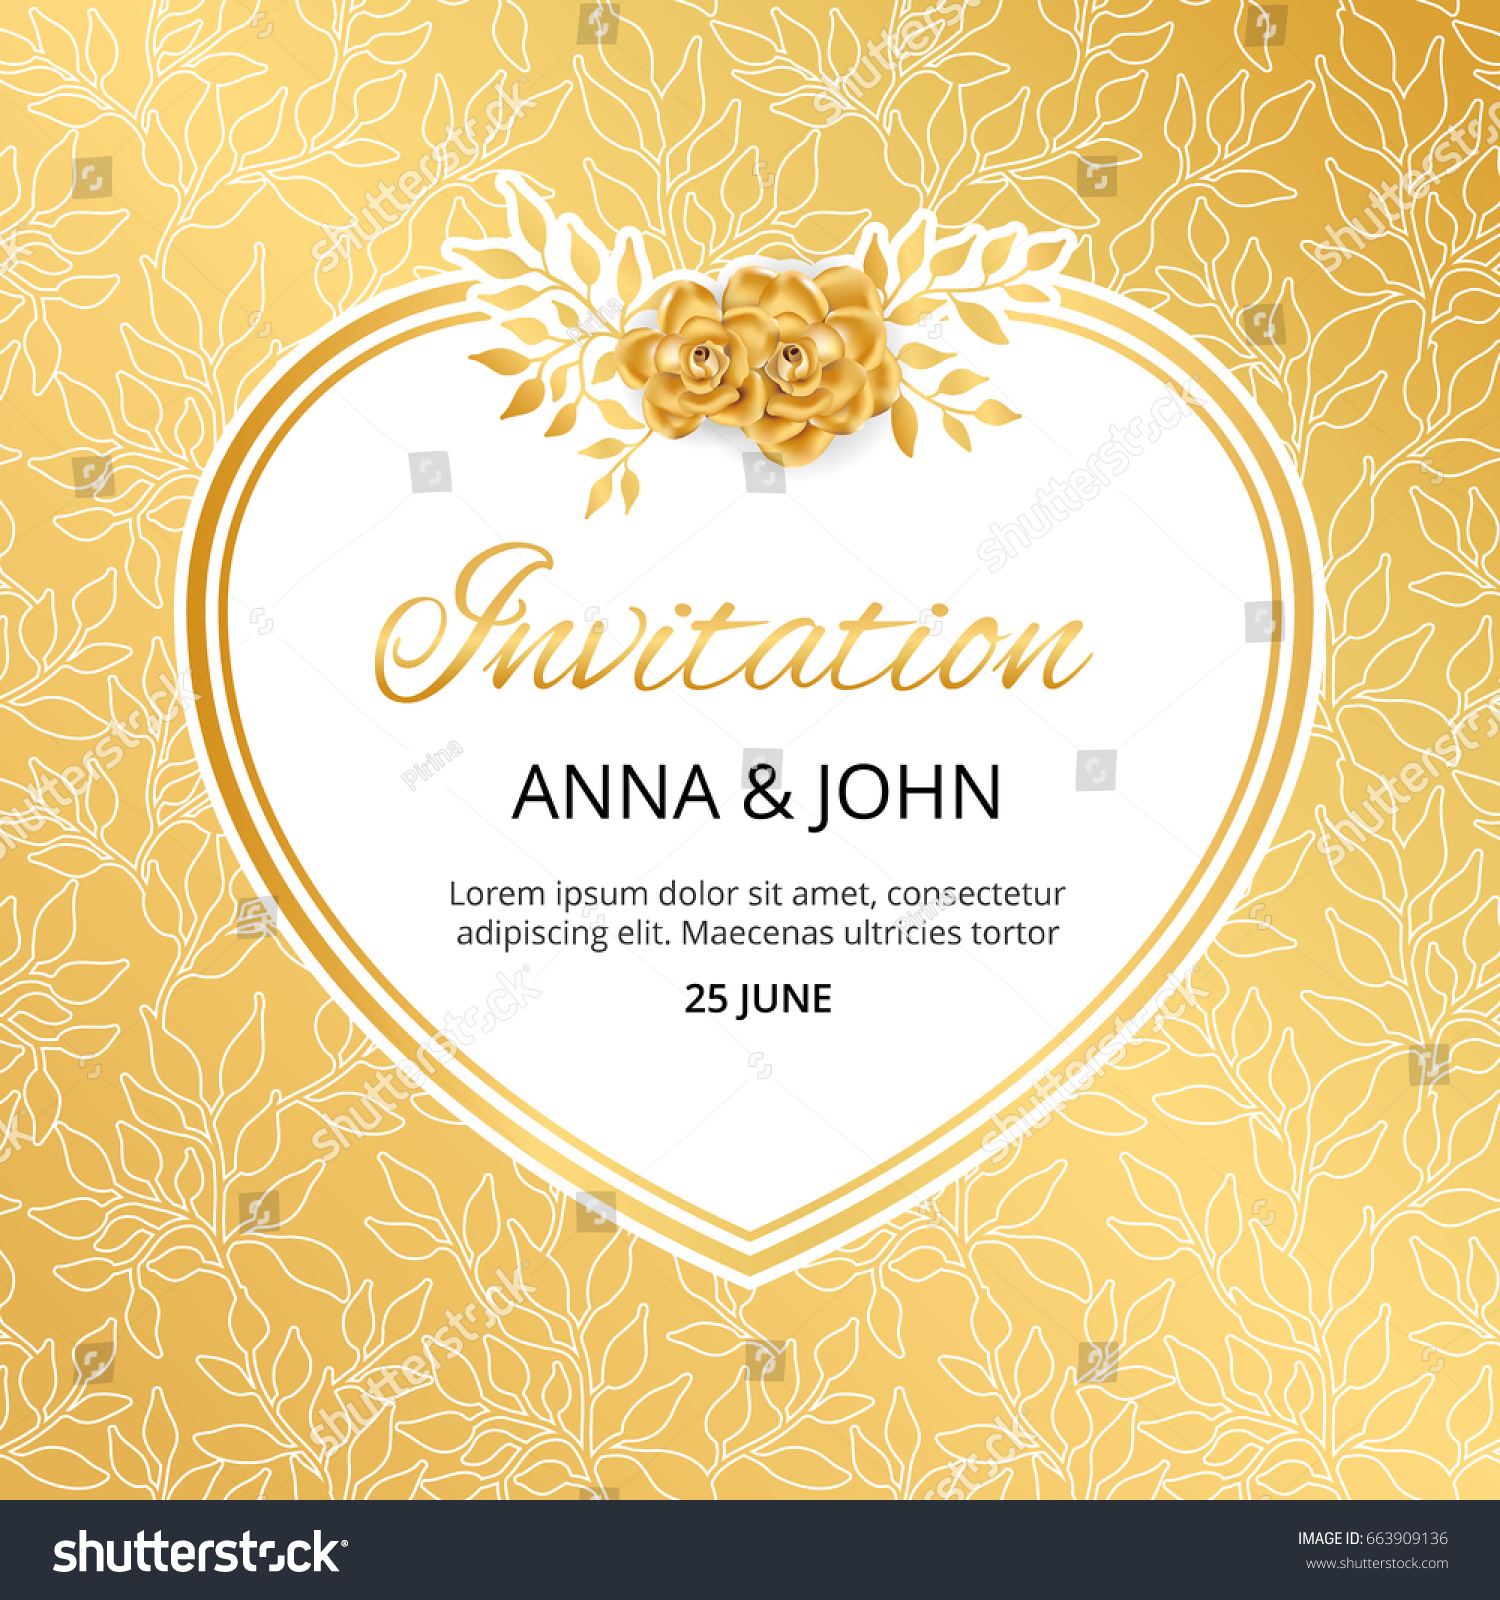 Gold Flower Wedding Heart Invitation Weddings Stock Vector Royalty